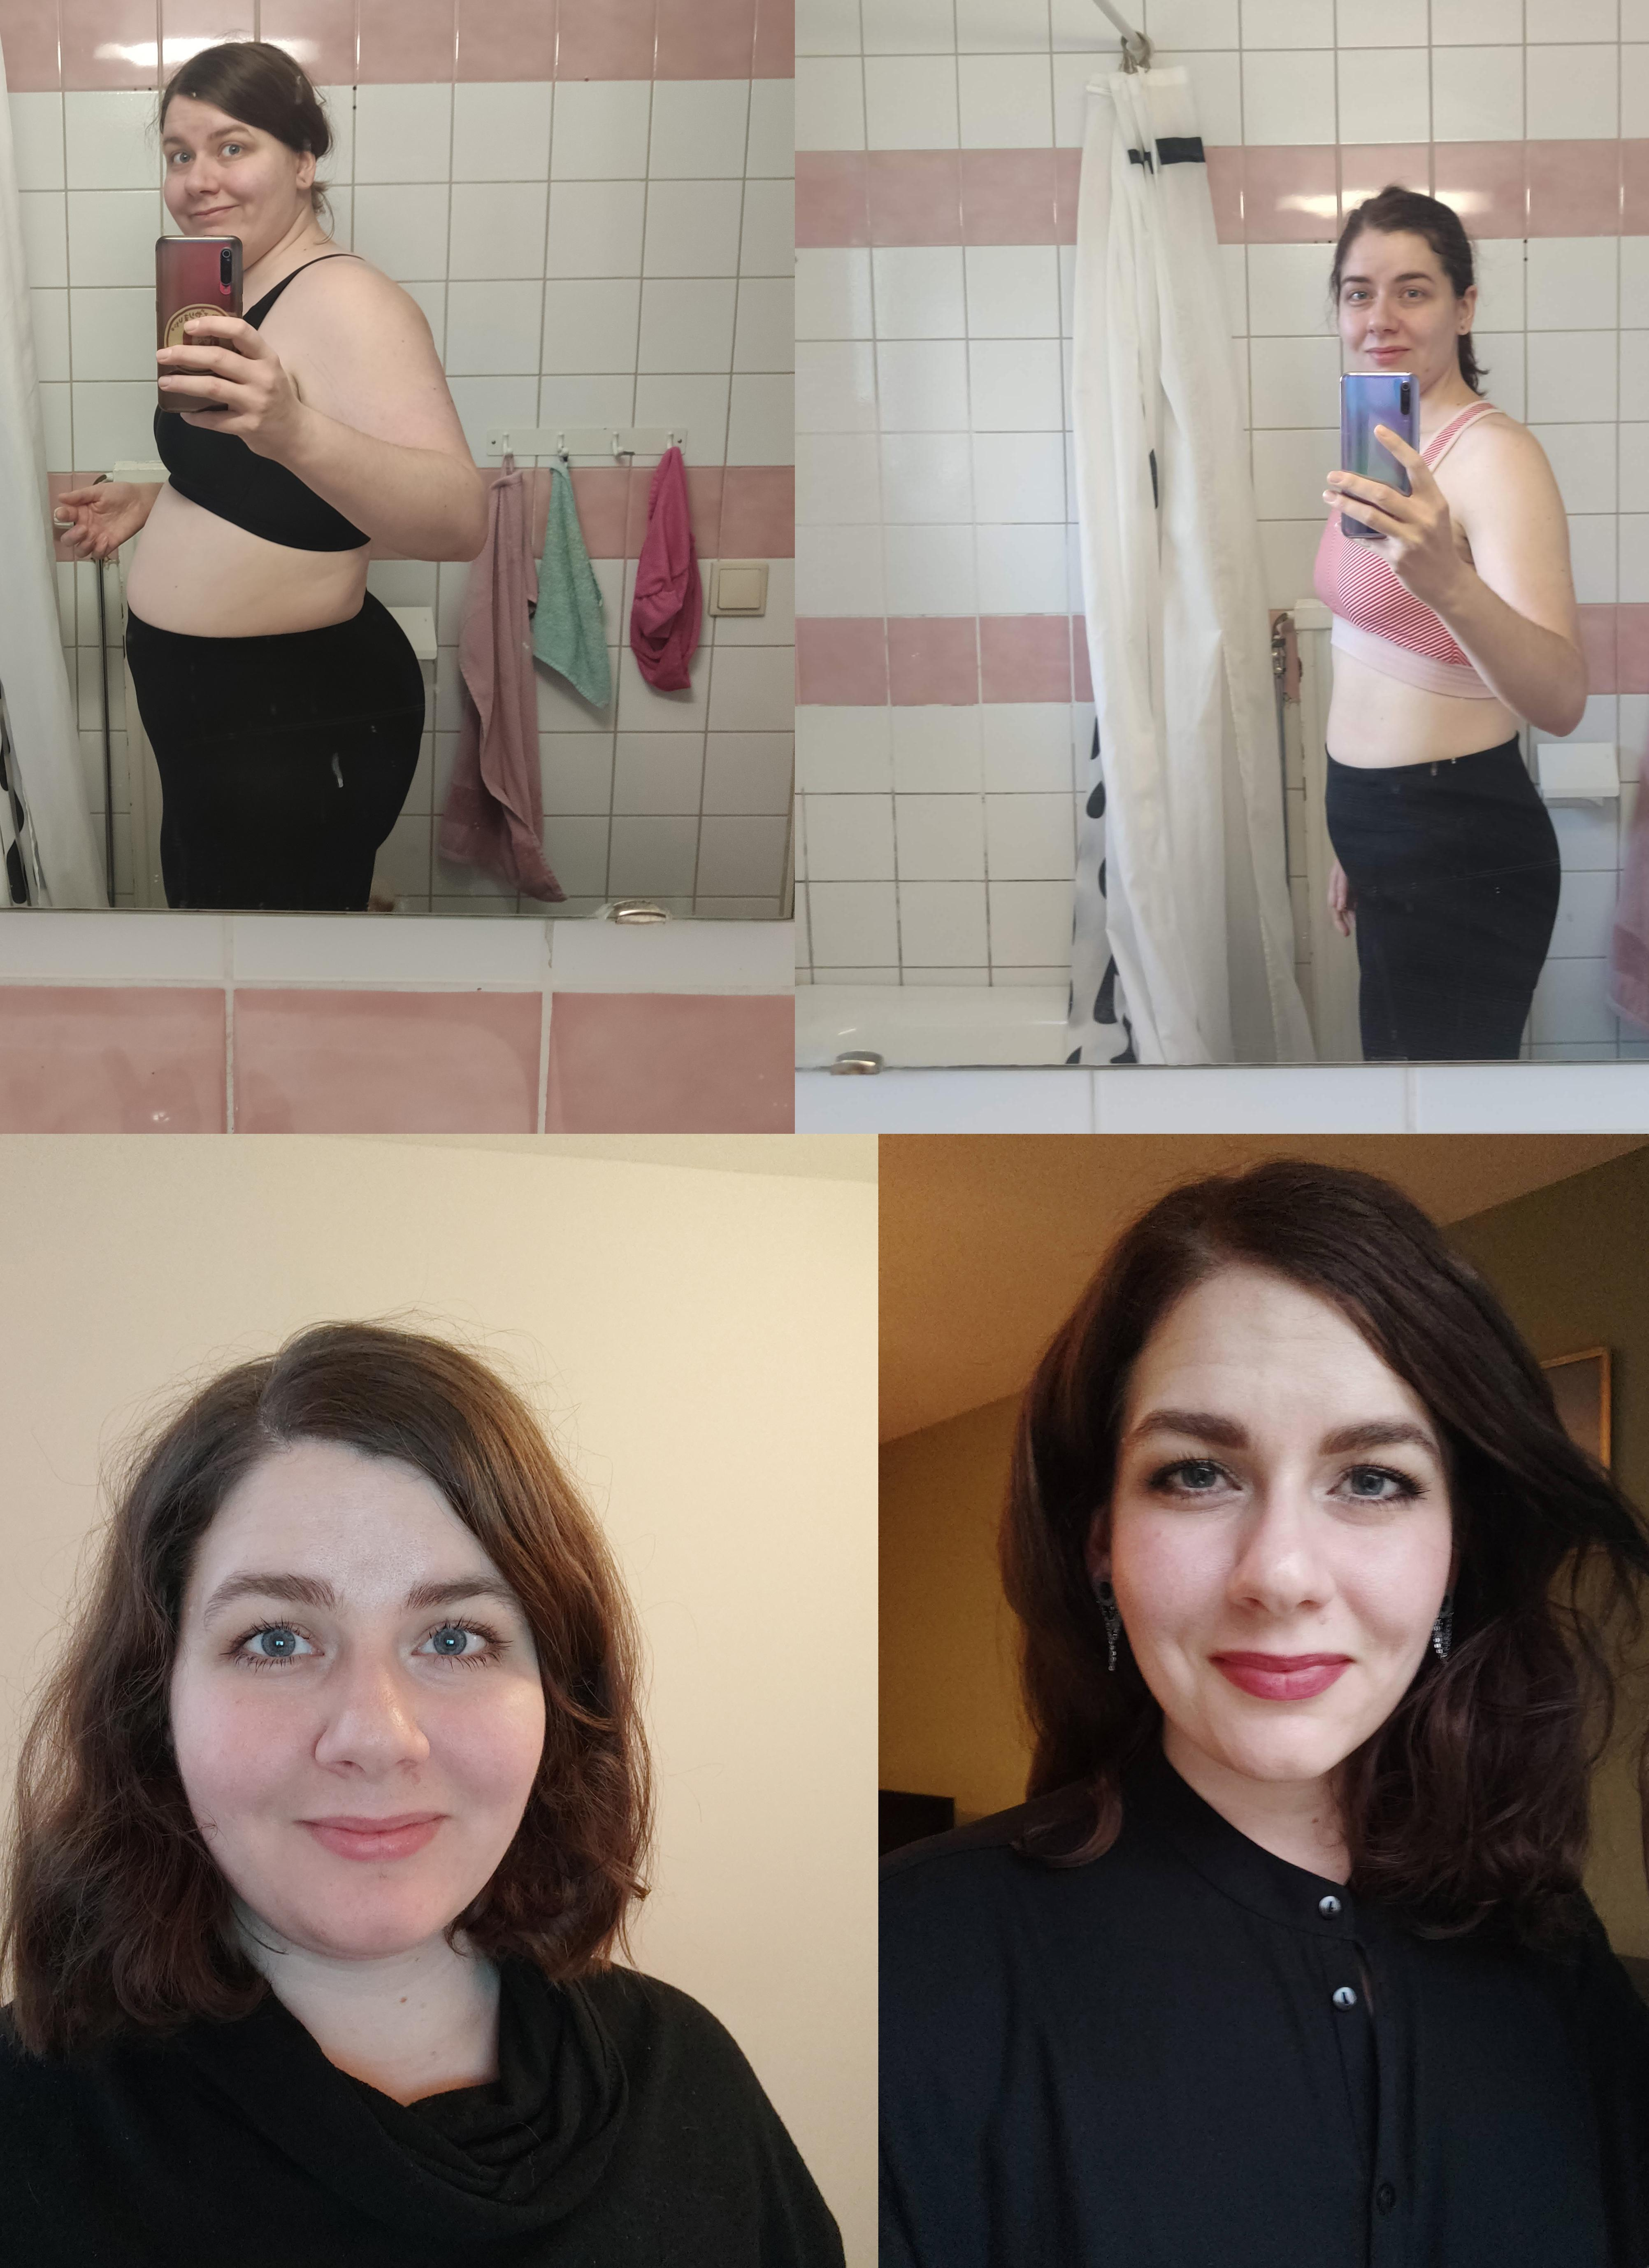 5'7 Female 68 lbs Weight Loss 242 lbs to 174 lbs